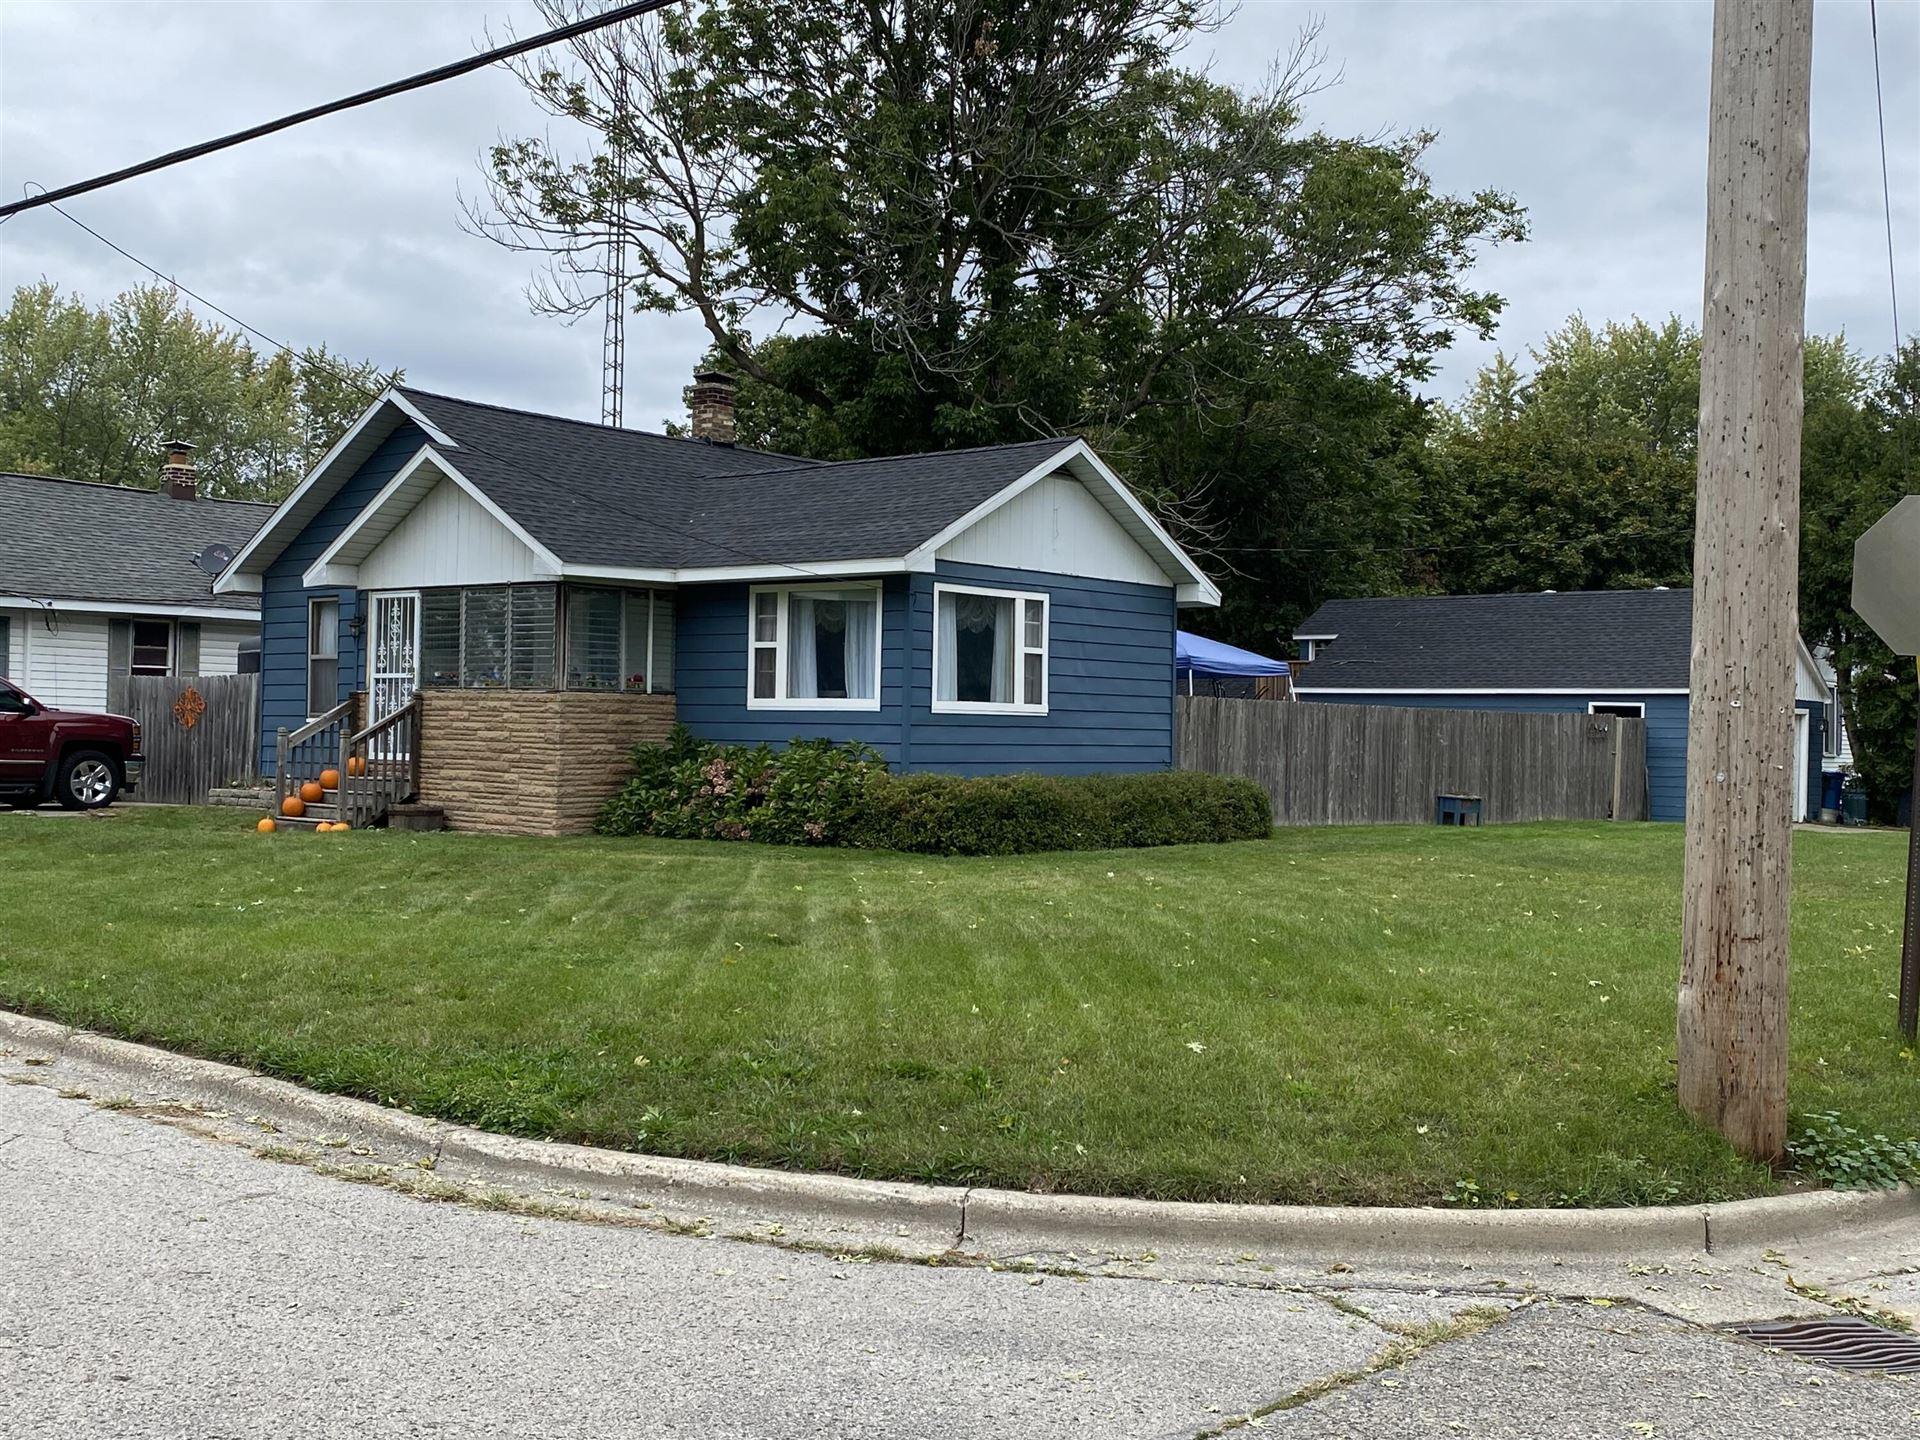 Photo of 950 Young Avenue, Muskegon, MI 49441 (MLS # 21109978)